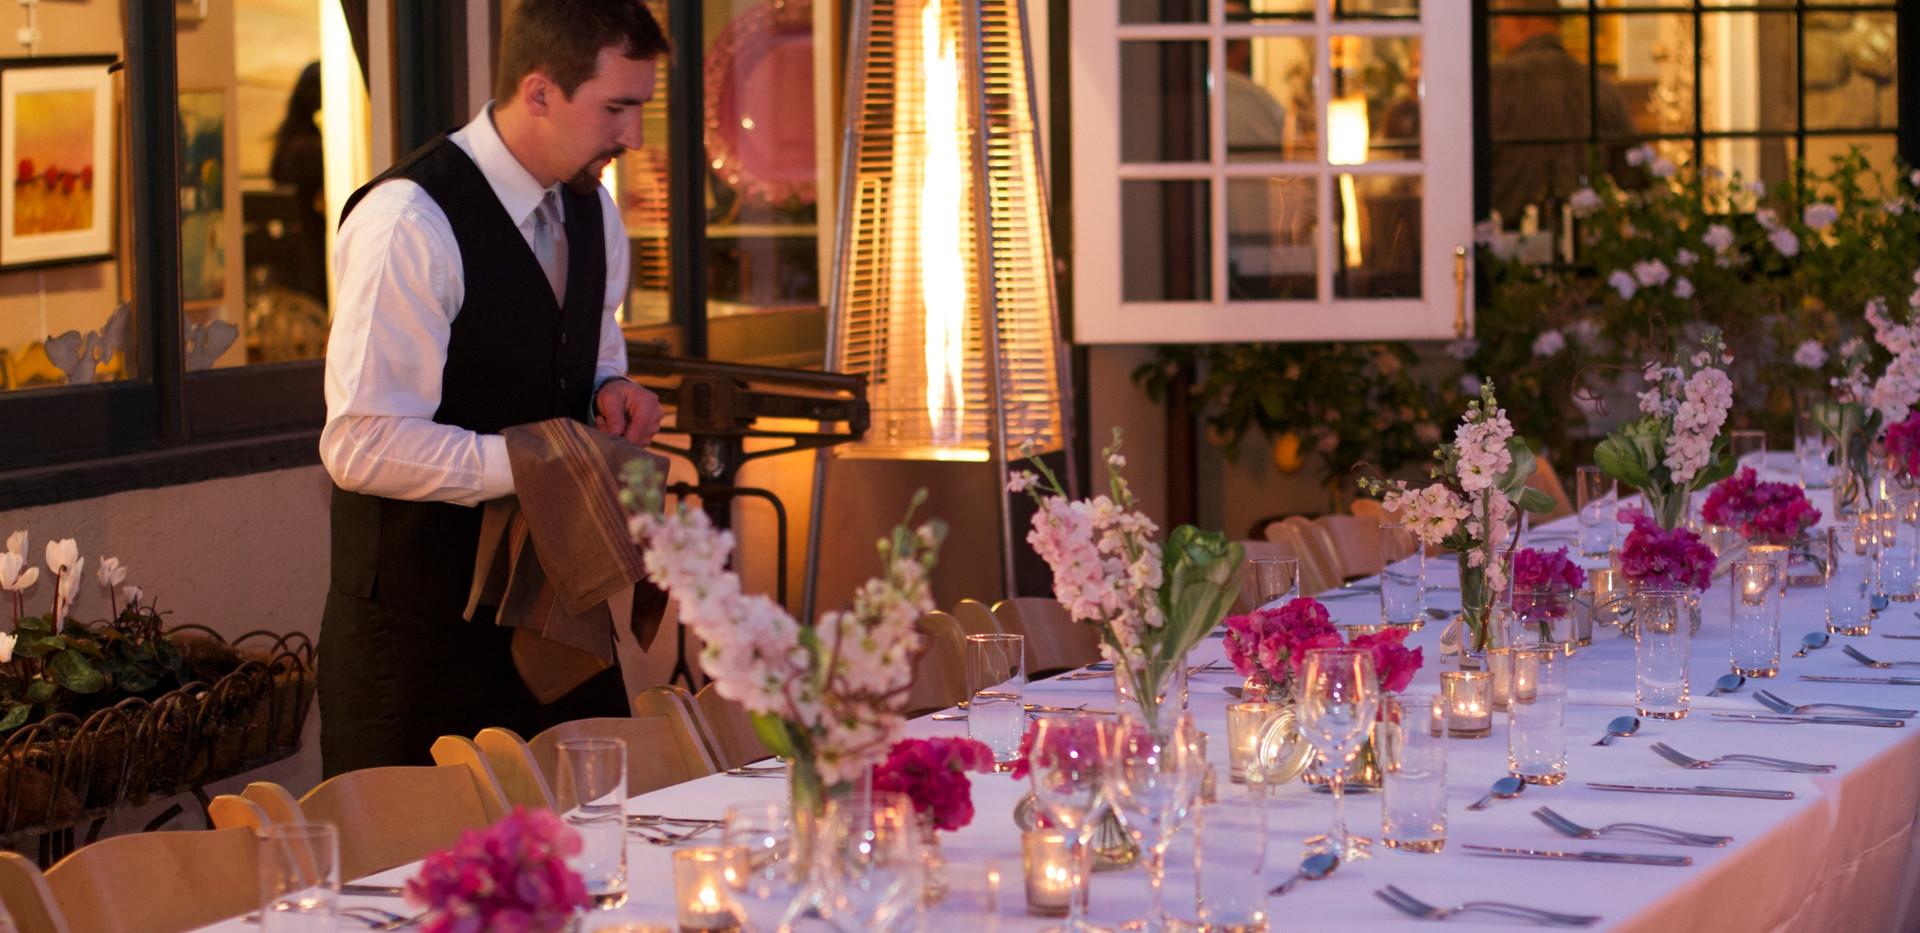 Elegant and Formal Dining